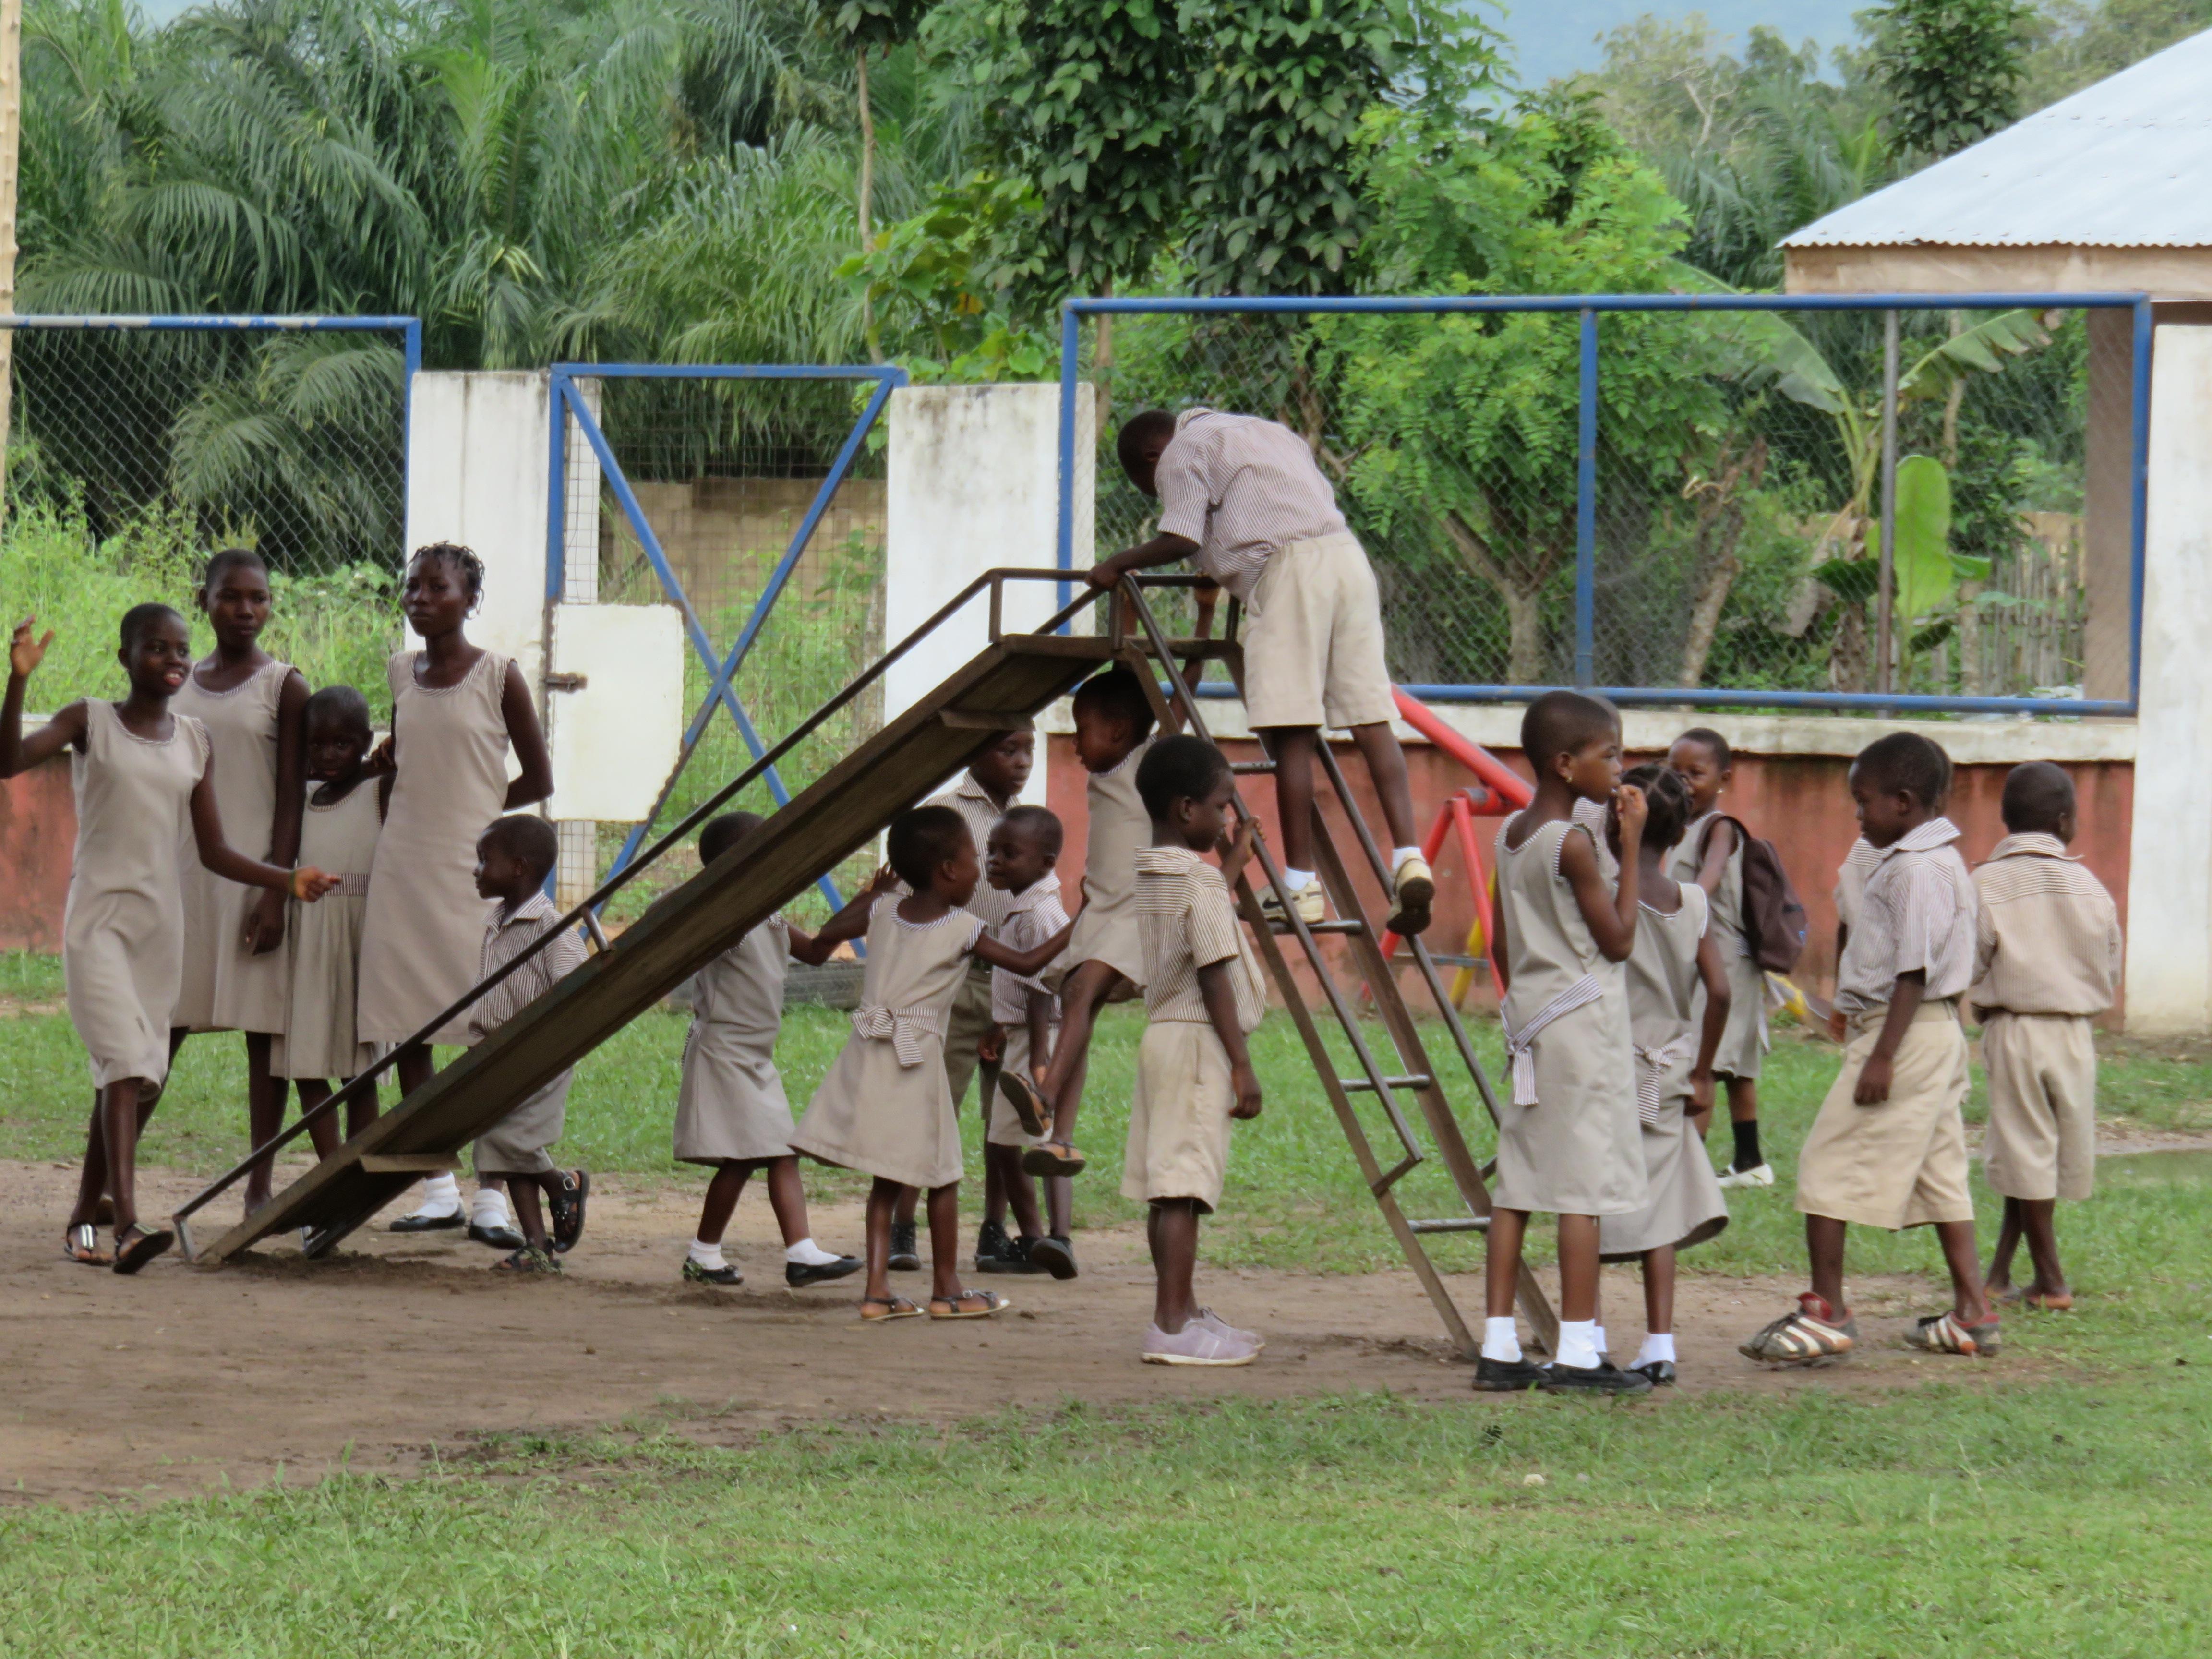 Hohoe Charity School